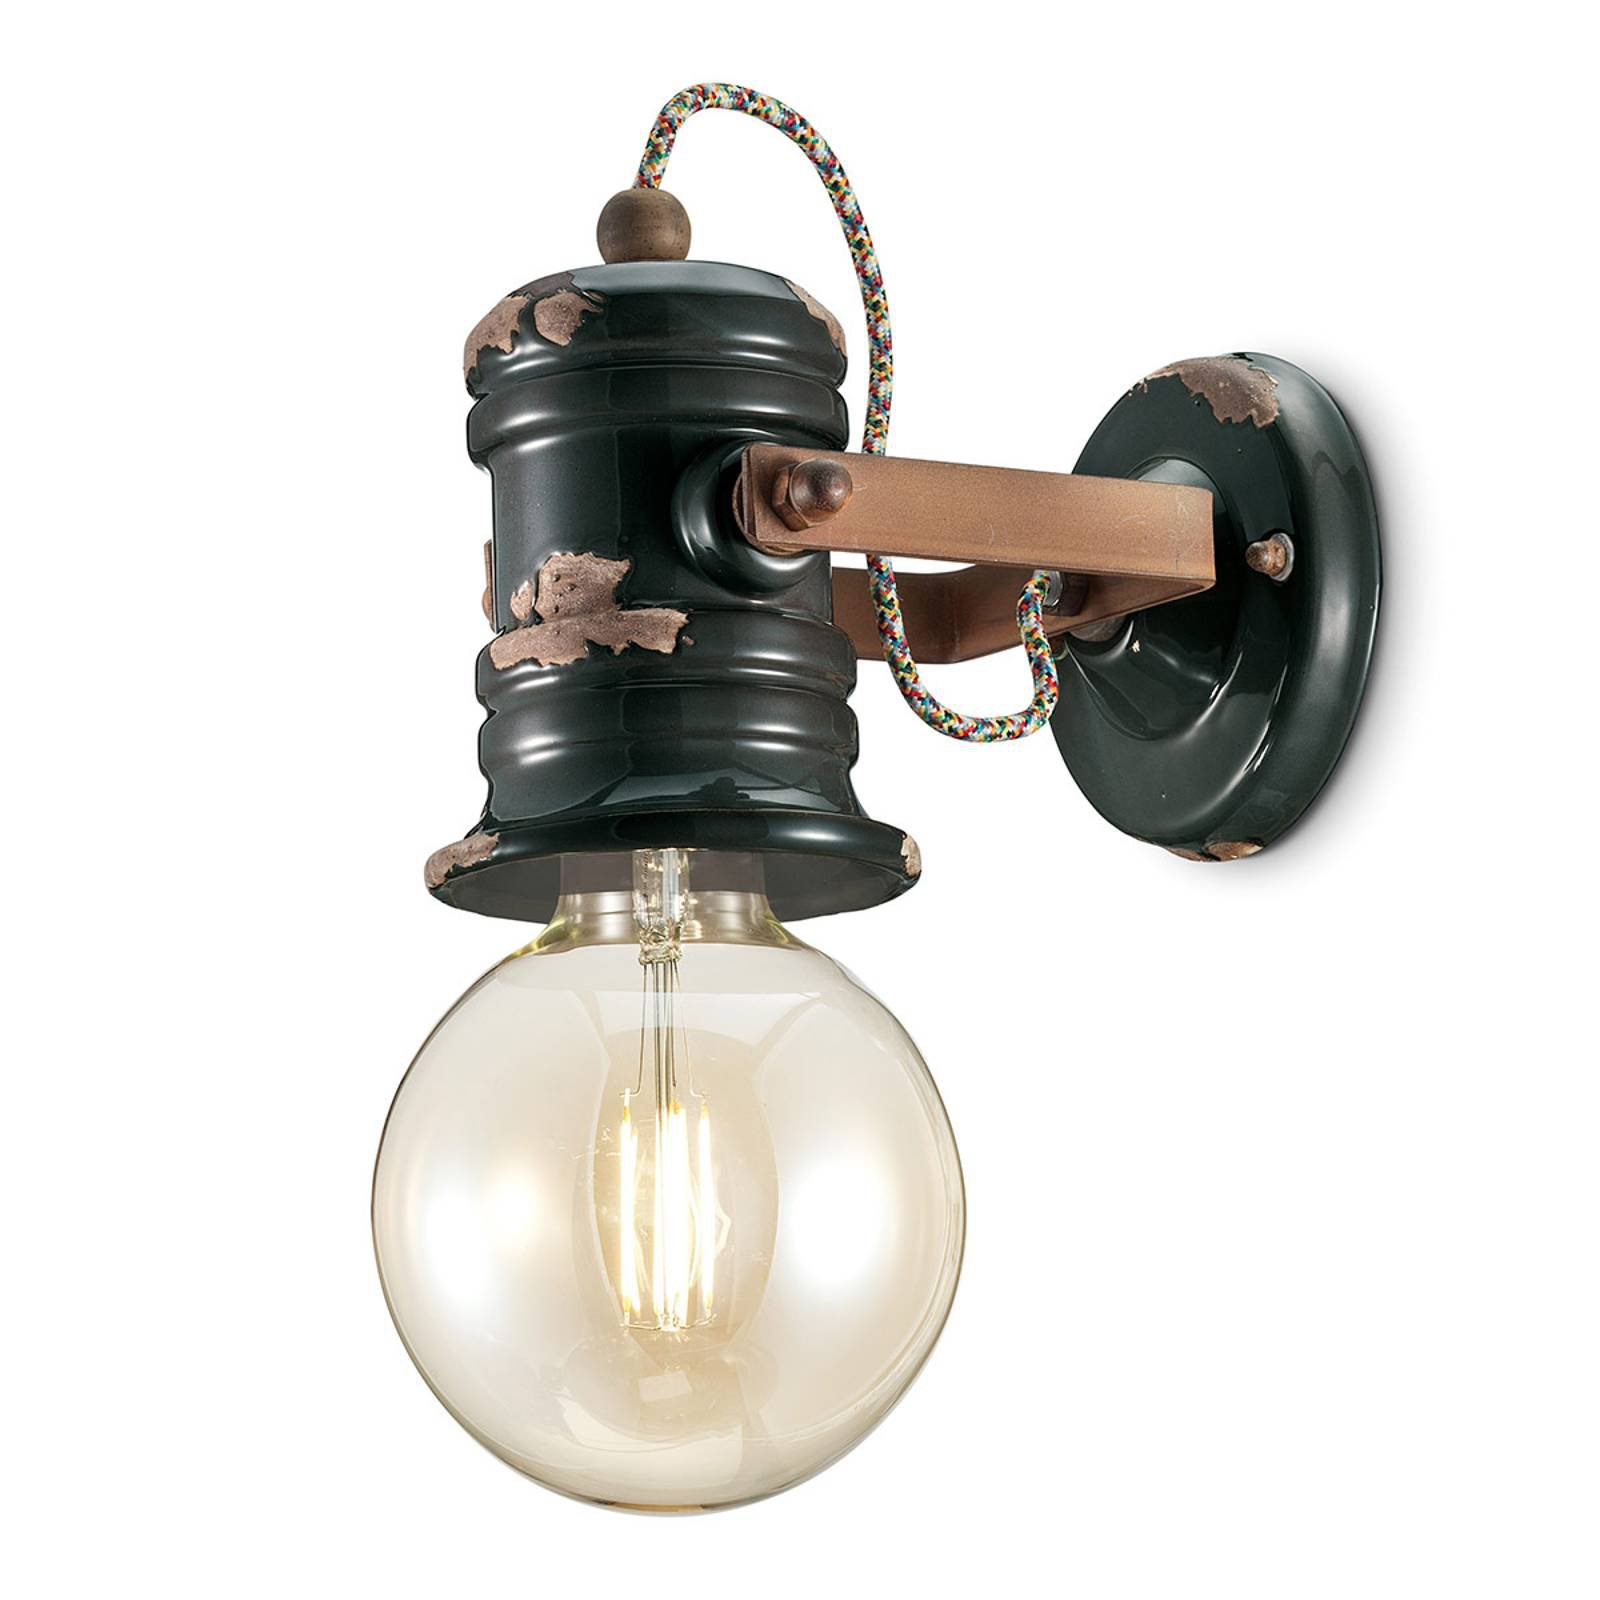 Vegglampe C1843 i vintagedesign svart